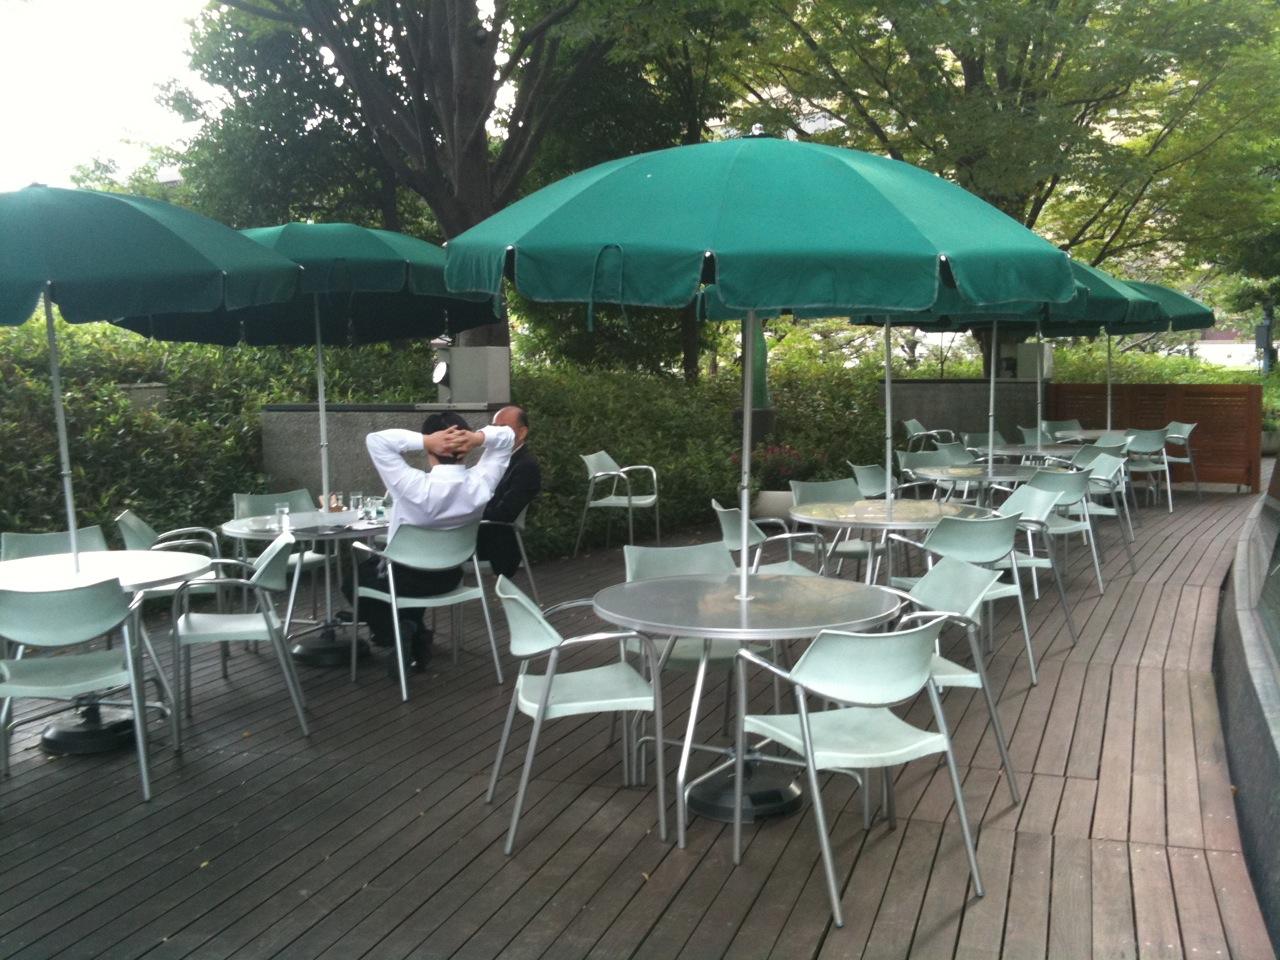 Marketing Japan: The Best Coffee Shop in Tokyo - Free Refills!